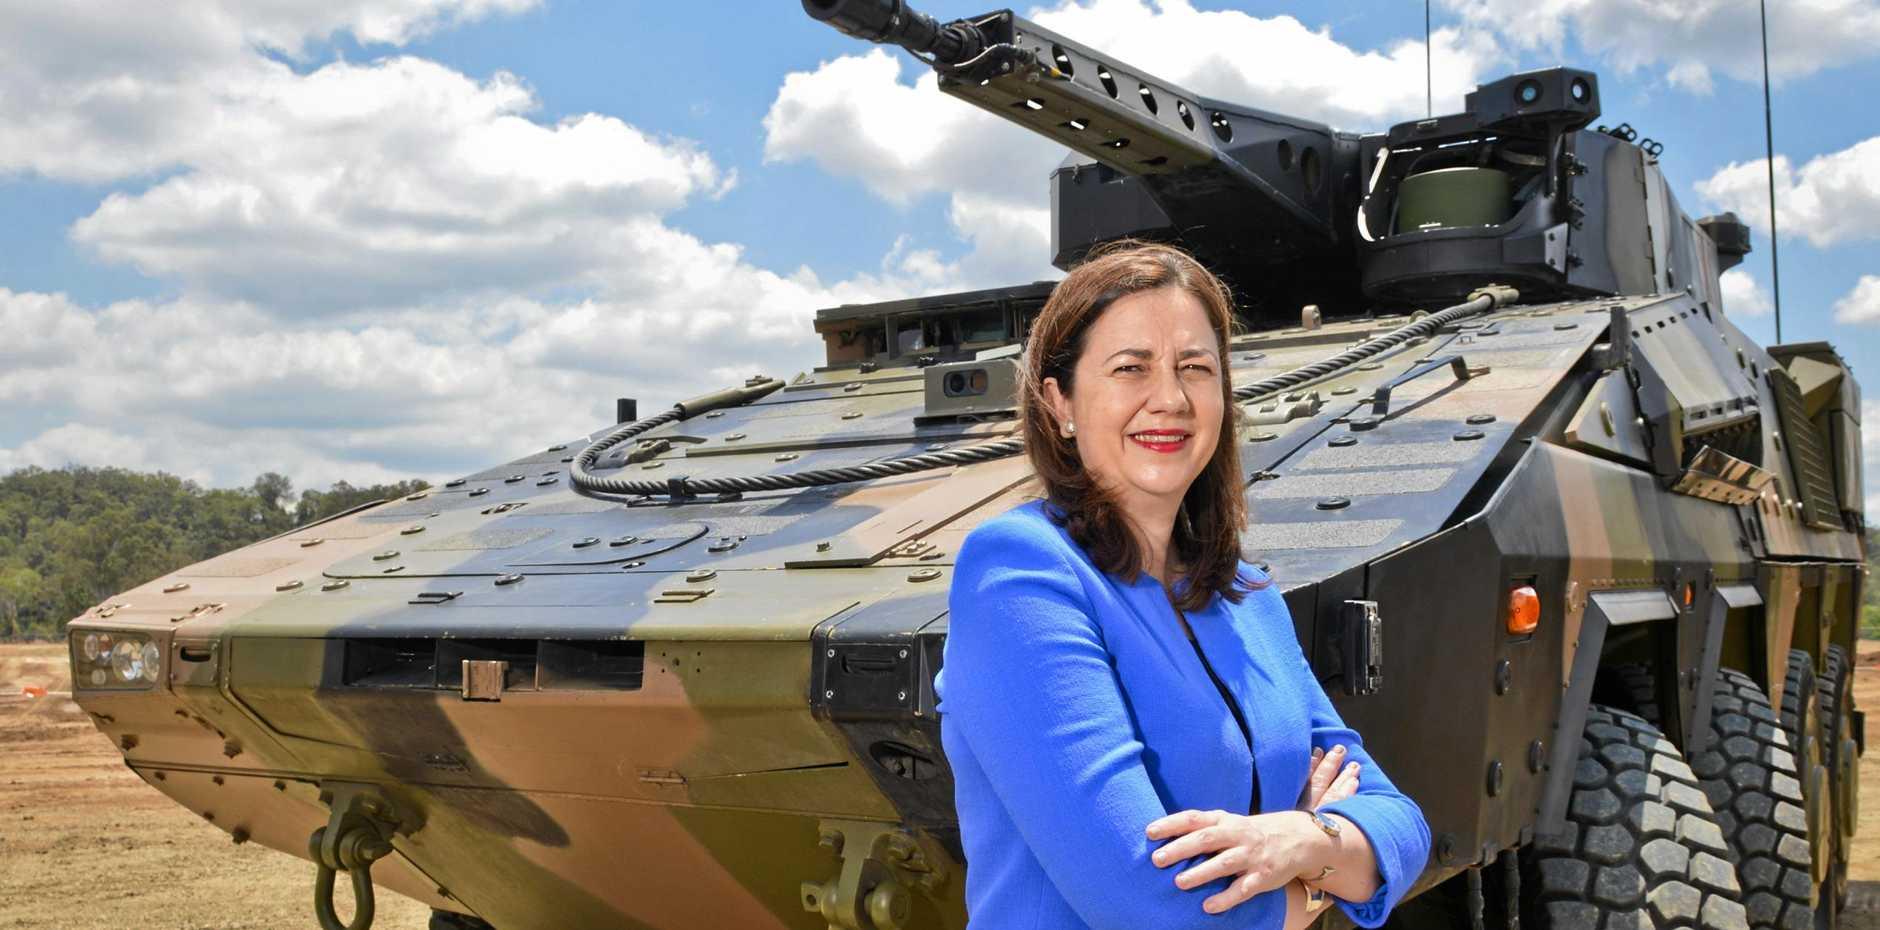 VISITING: Queensland Premier Annastacia Palaszczuk will visit the Sunshine Coast this week.